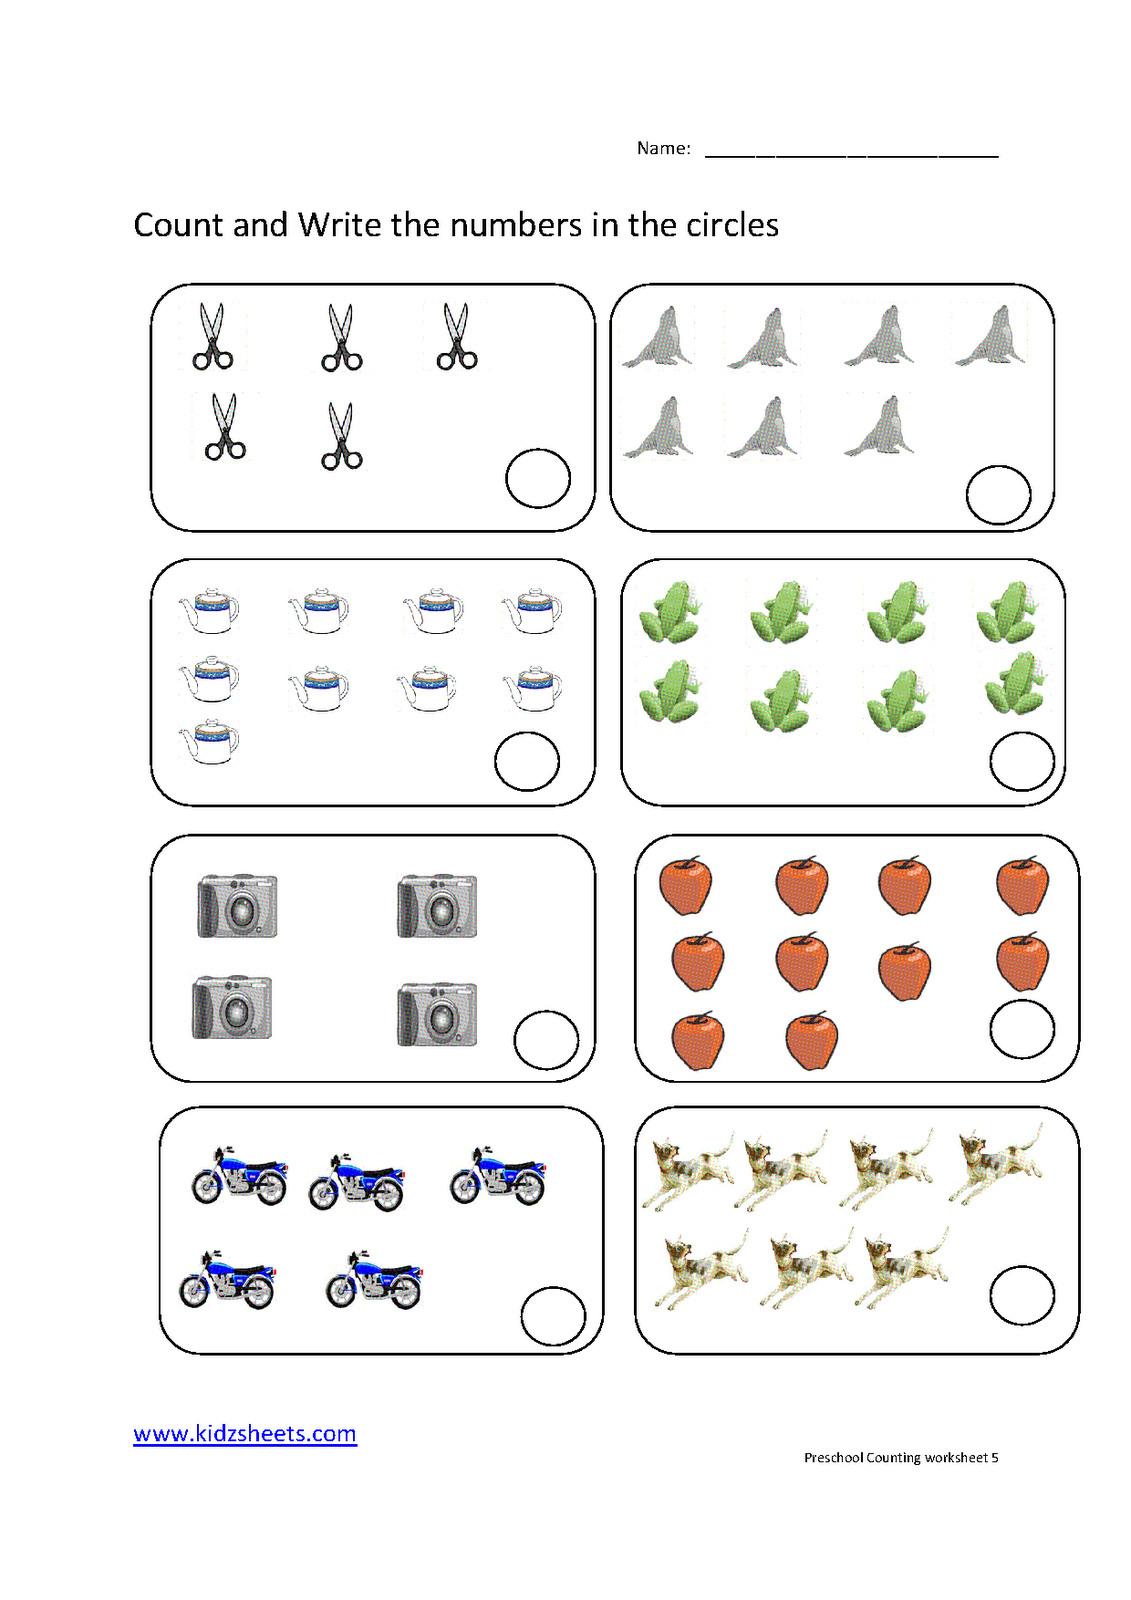 Preschool Counting Worksheets Free Printable Download Them